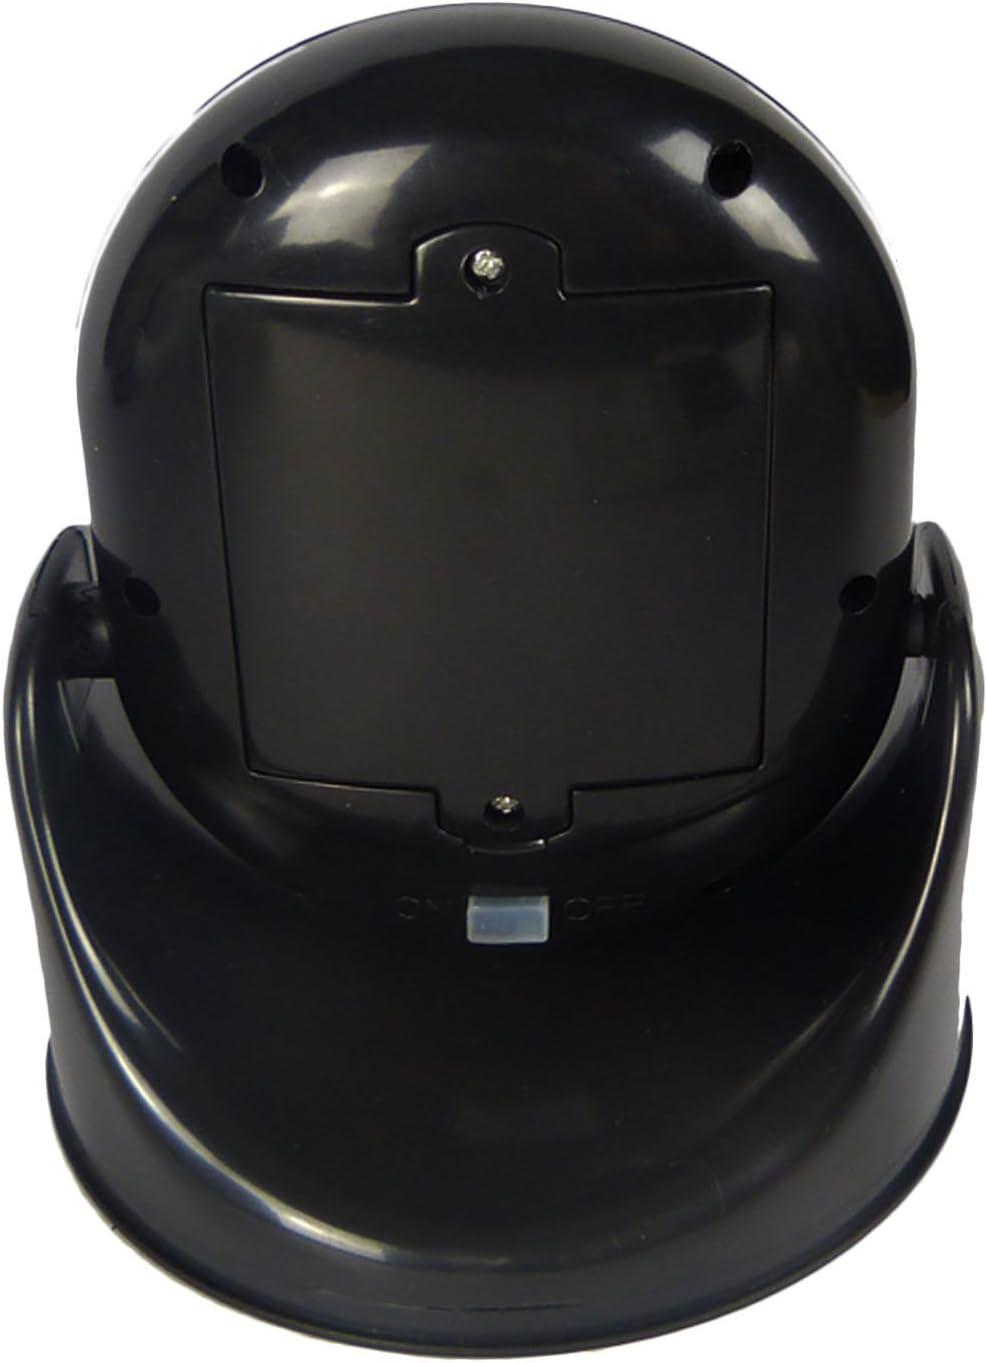 LED Motion Sensor Security Light 7 LED Cordless Rotating Base LED Light Indoor Black